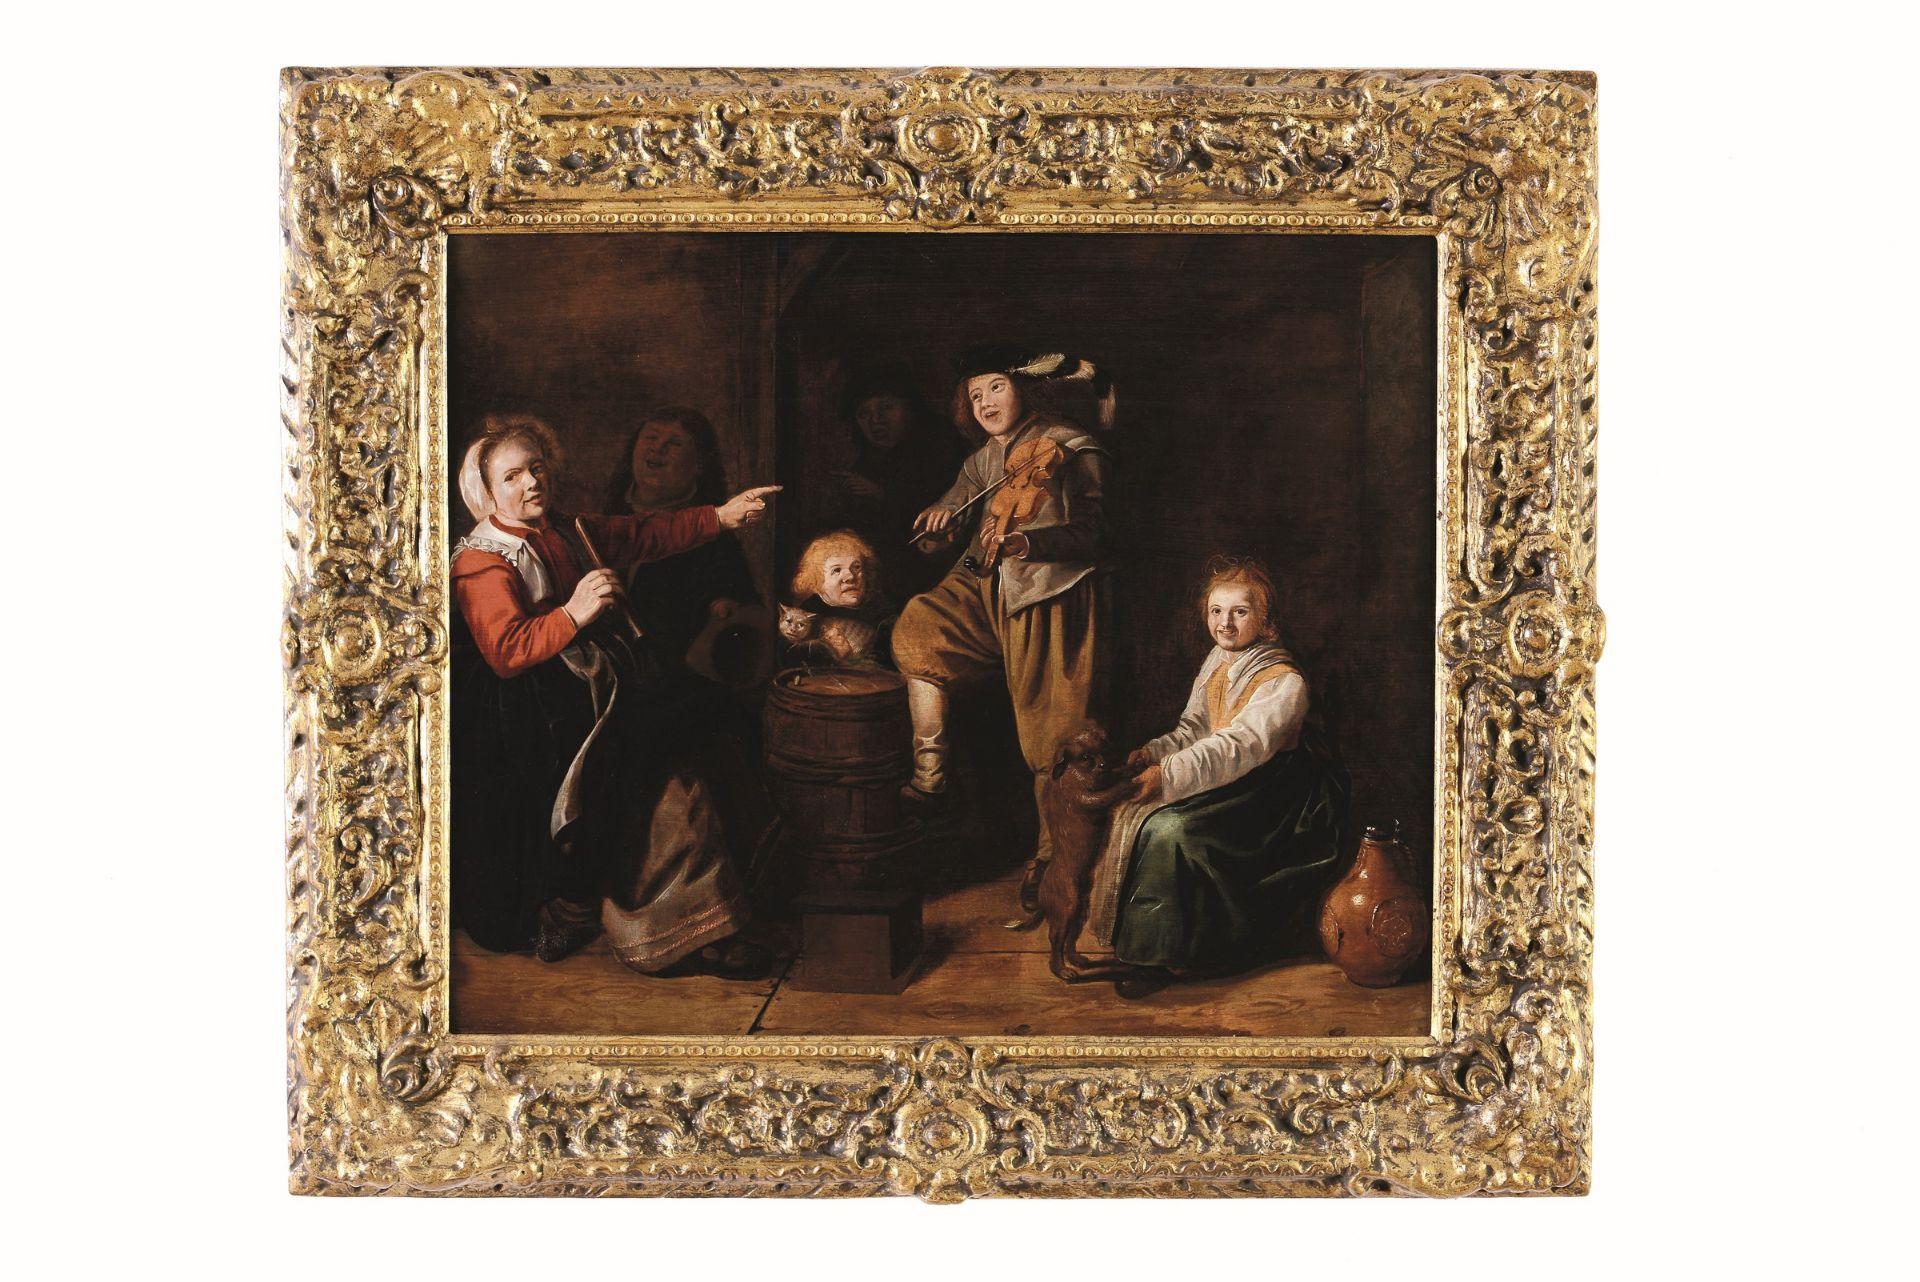 Jan Miense Molenaer (Haarlem 1610-1668), Interno con ragazzi che suonano - olio su [...]